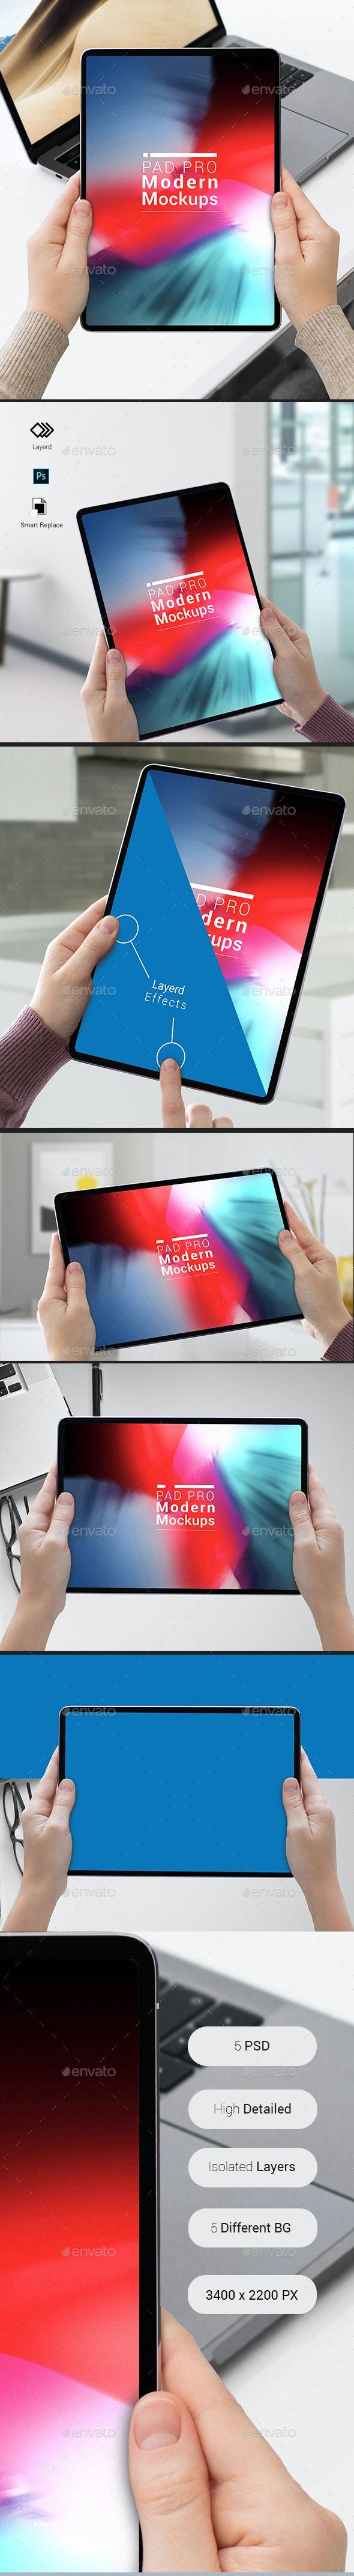 Pad Pro Modern Mockups - Mobile Displays